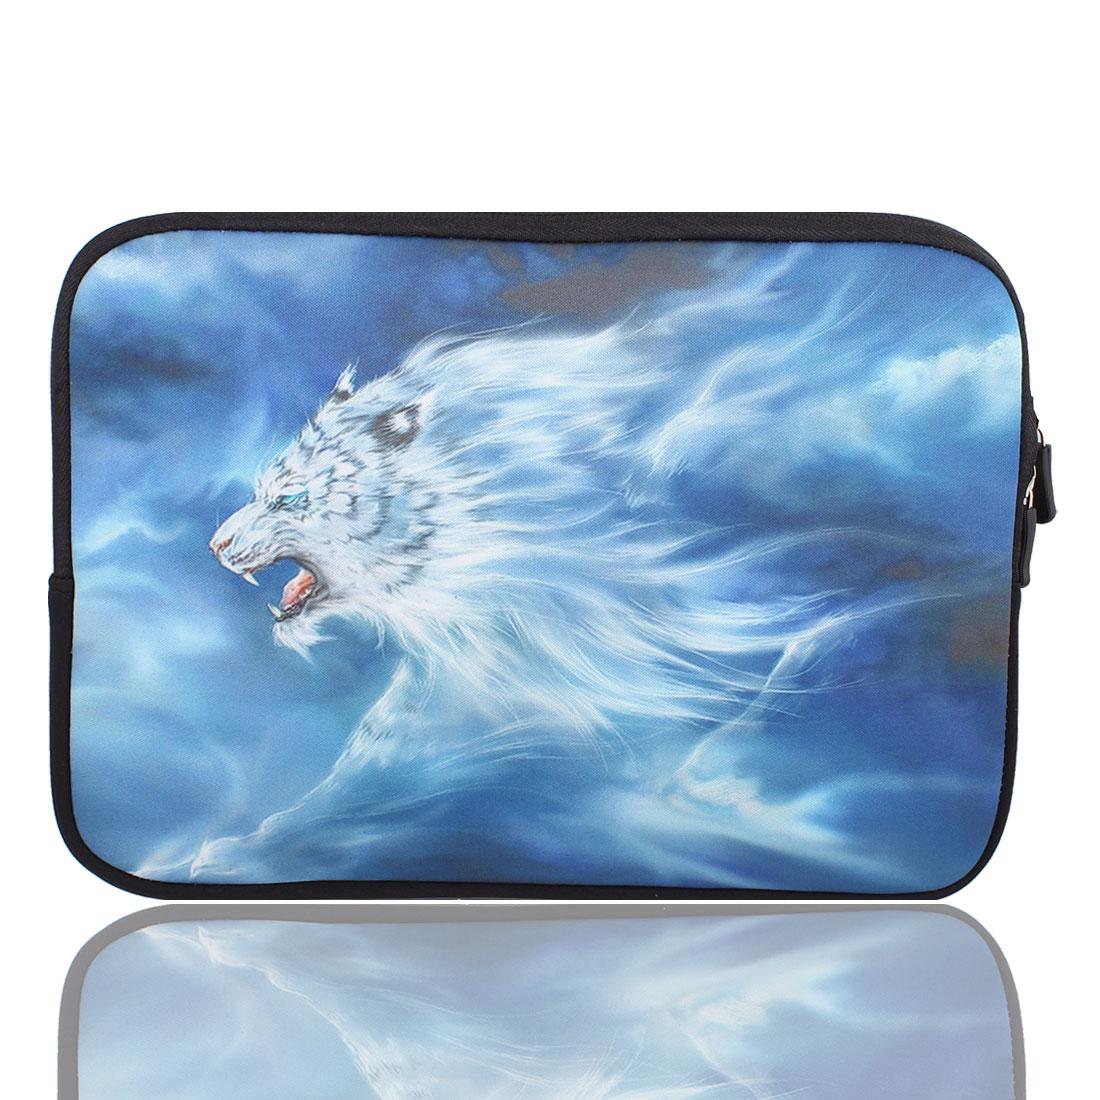 "Wolf Print 10"" 10.1"" 10.2"" Neoprene Notebook Laptop Sleeve Bag Case"